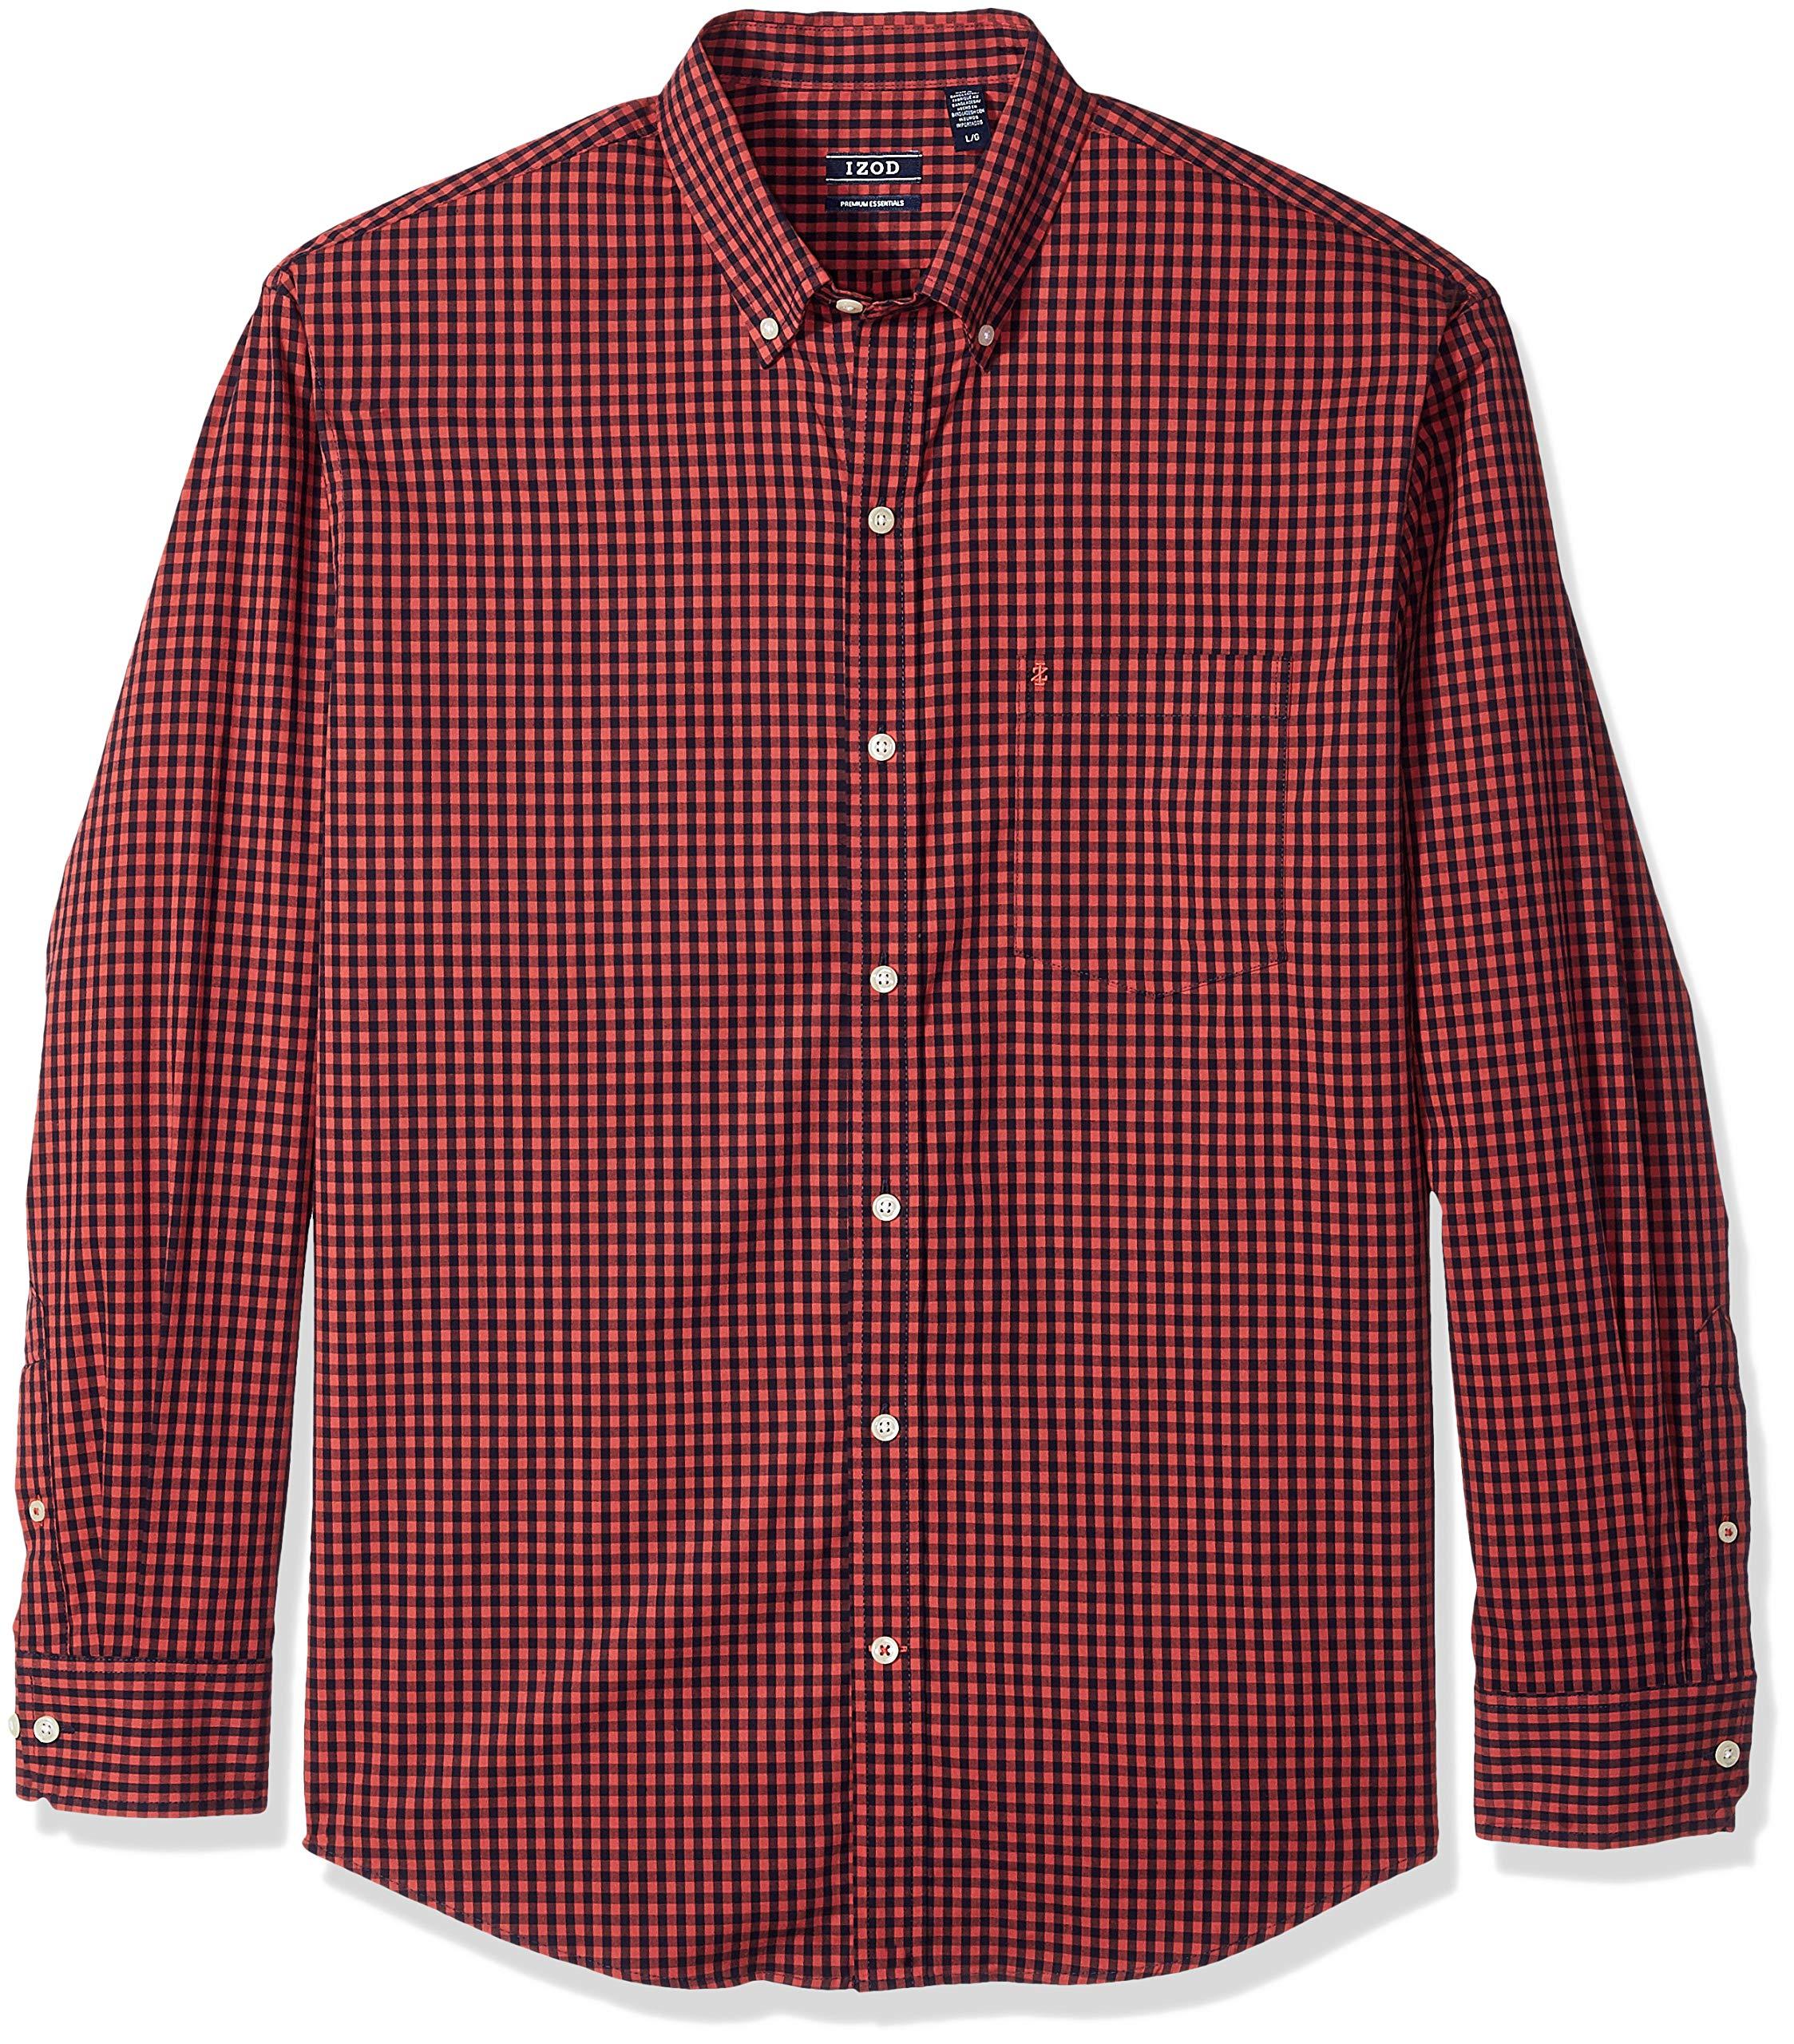 Men/'s Big /& Tall IZOD Premium Essentials Natural Stretch Cotton Button Up Shirt